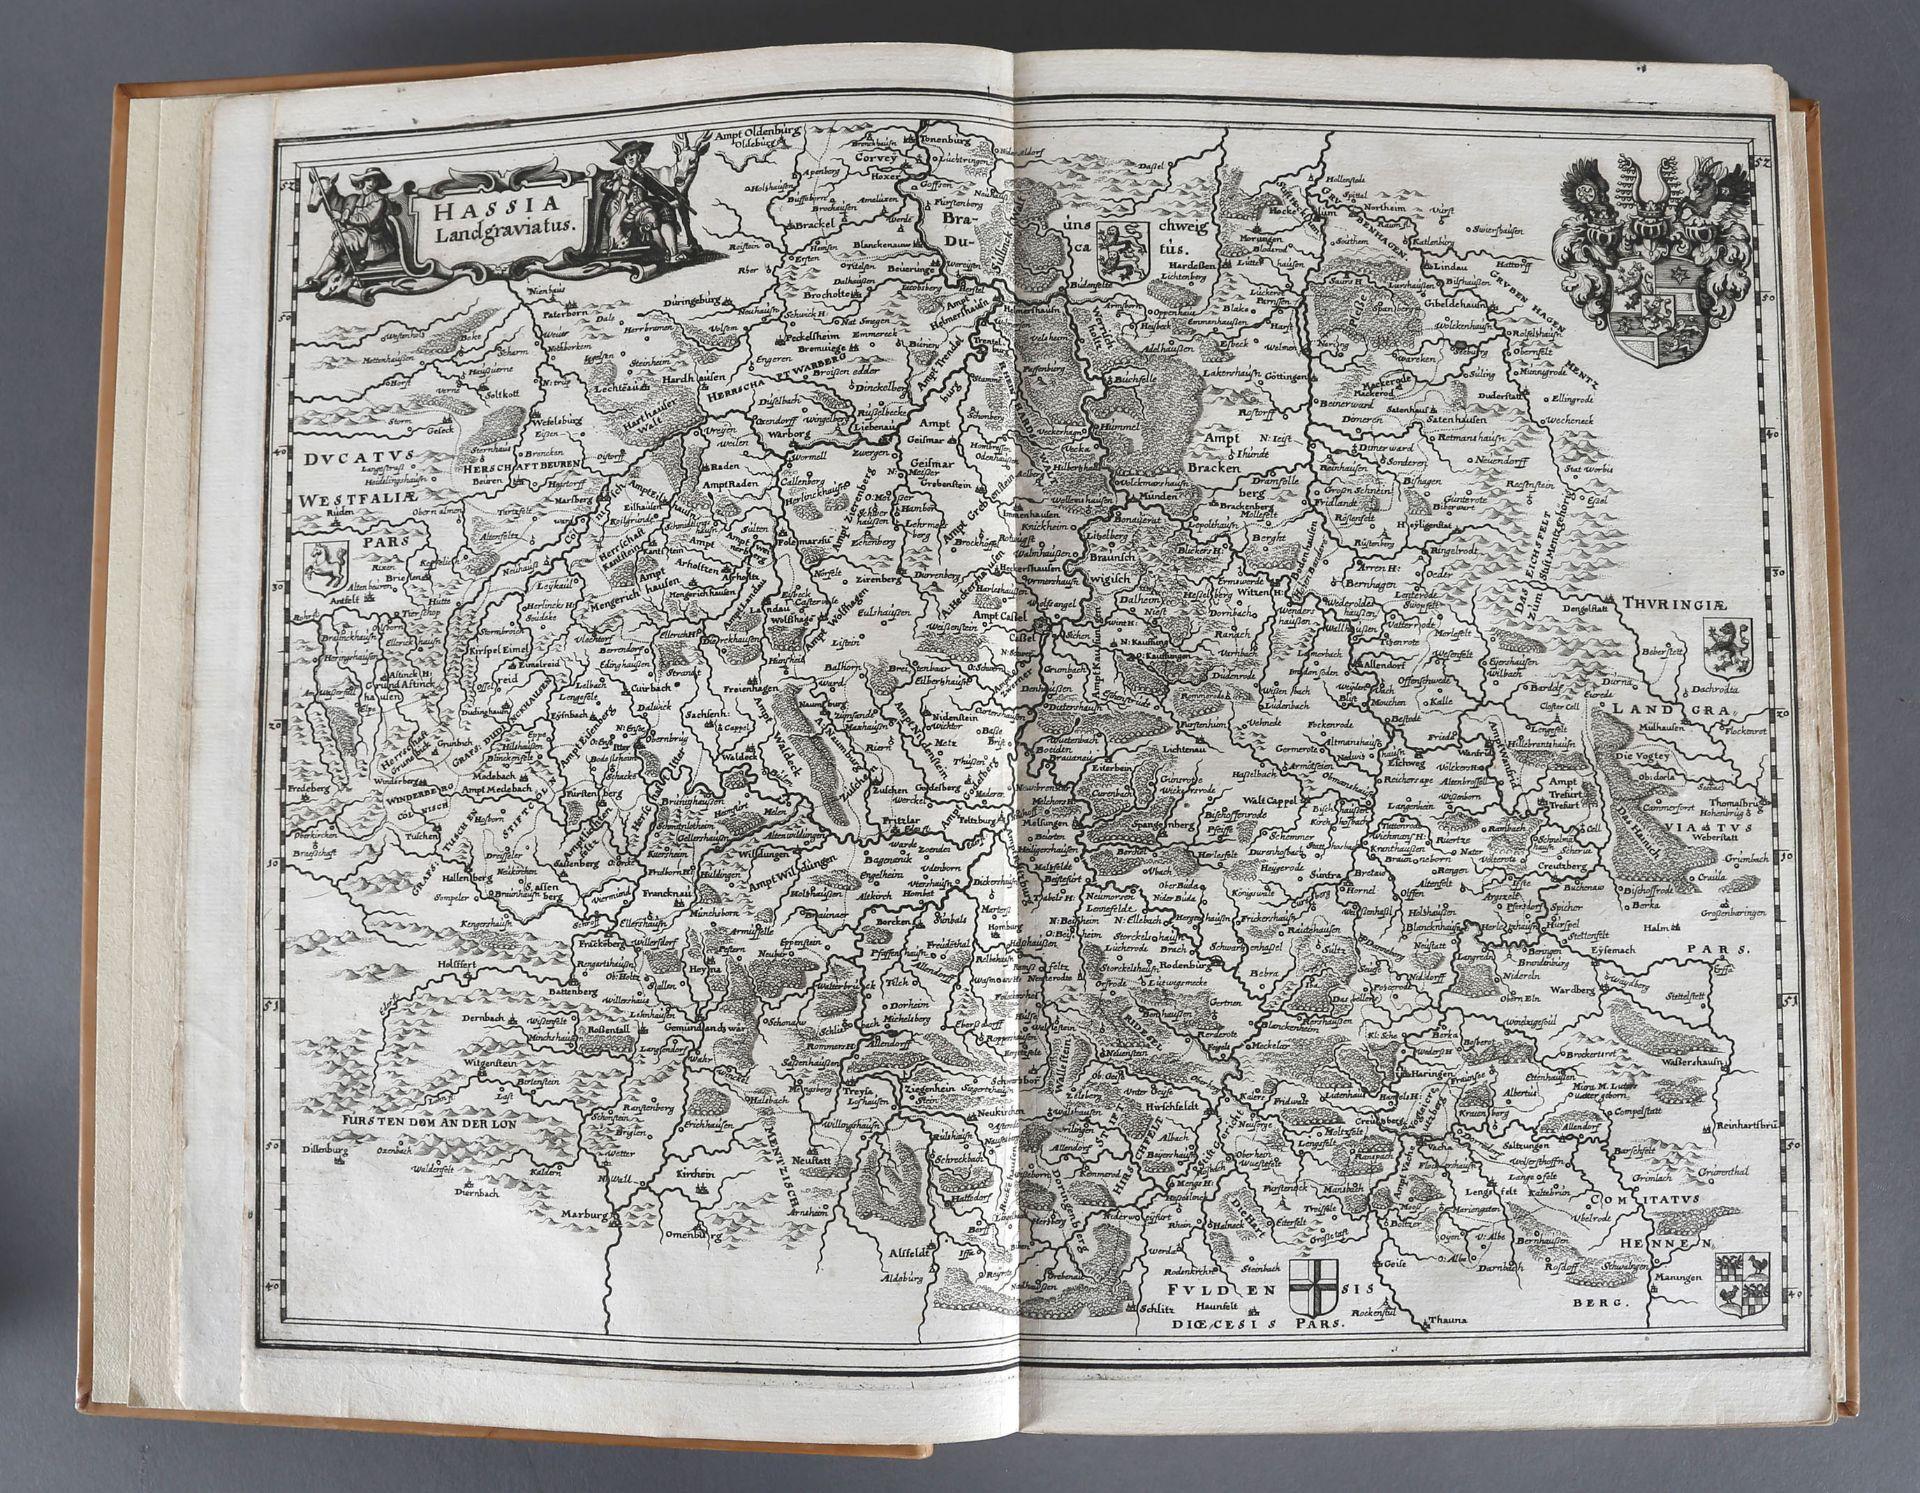 Matthäus Merian (Stiche) und Martin Zeiller (Text), Topographia Hassiae et Regionum Vicinarum - Image 3 of 3